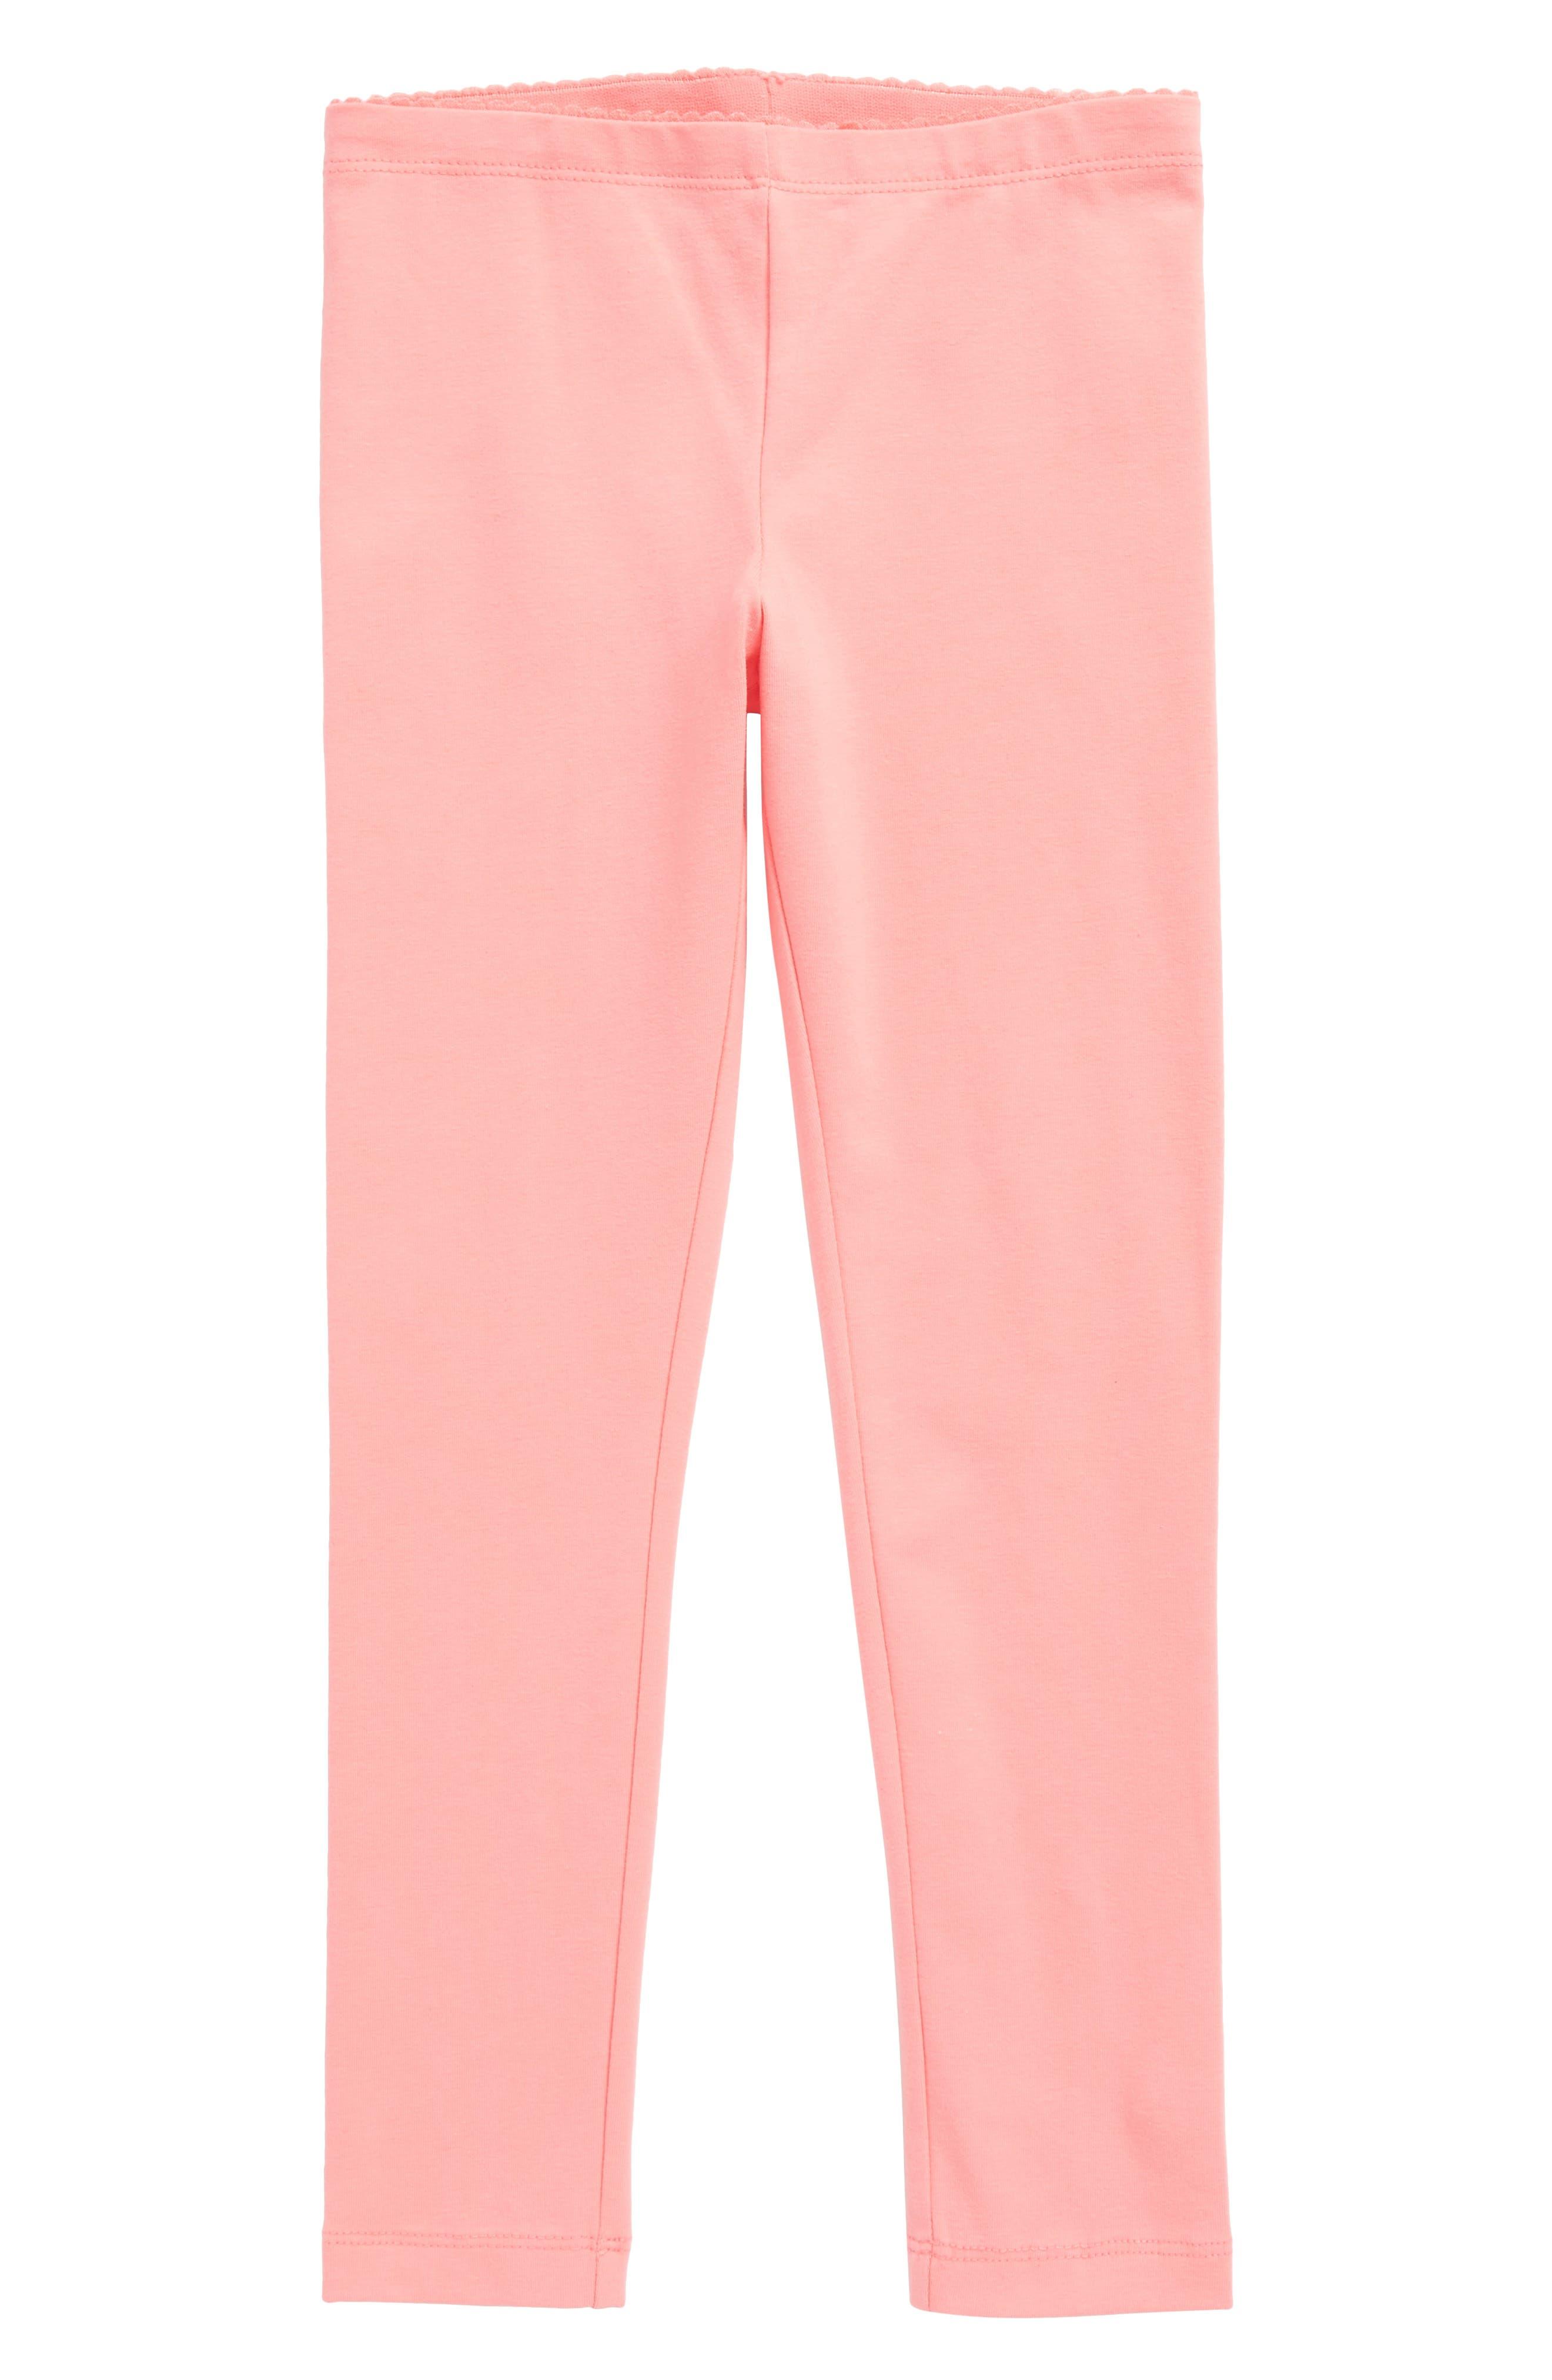 Solid Leggings,                             Main thumbnail 1, color,                             Neon Rosa